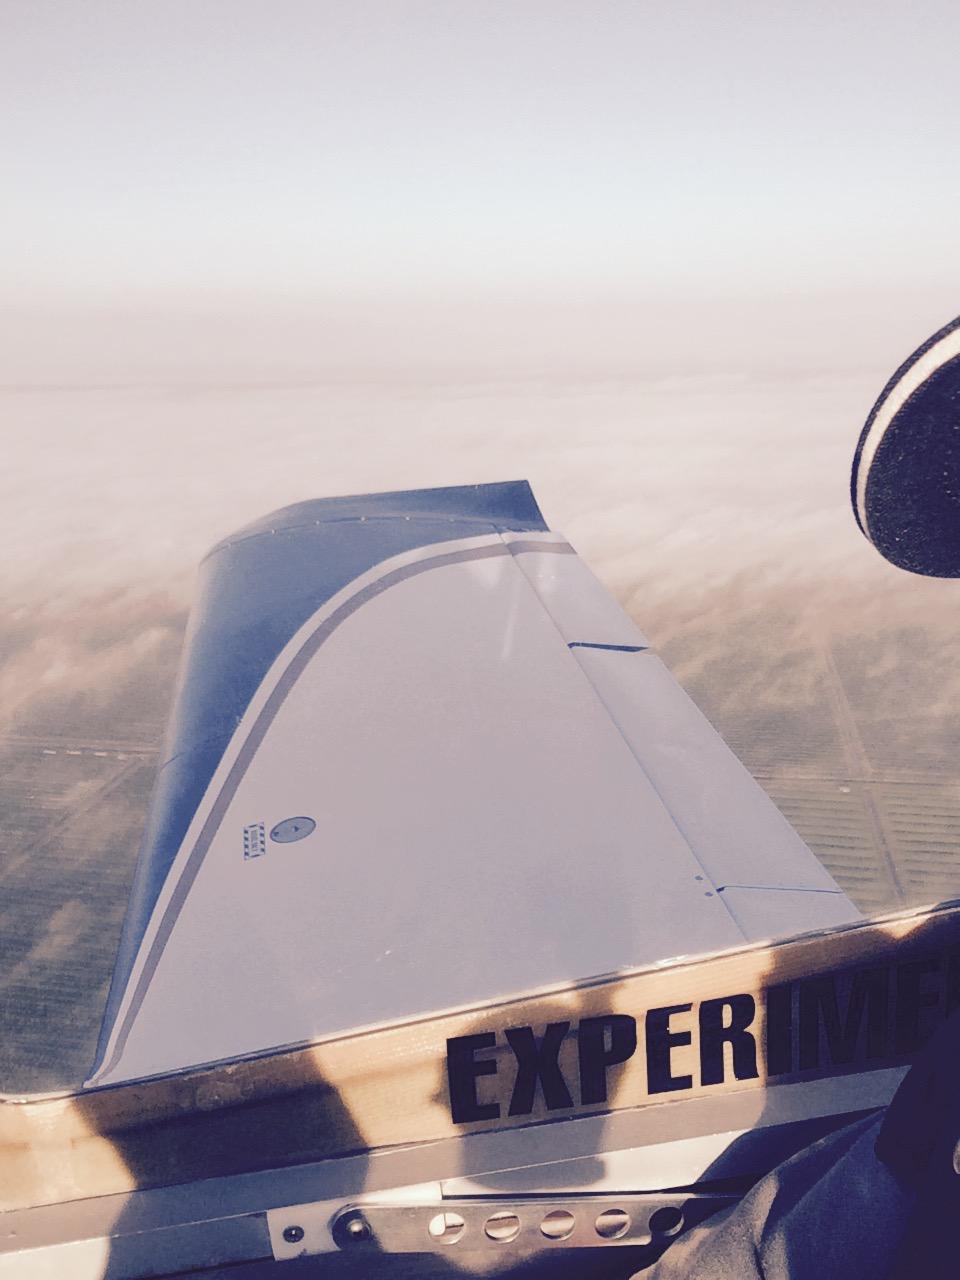 BD-17L Wing view